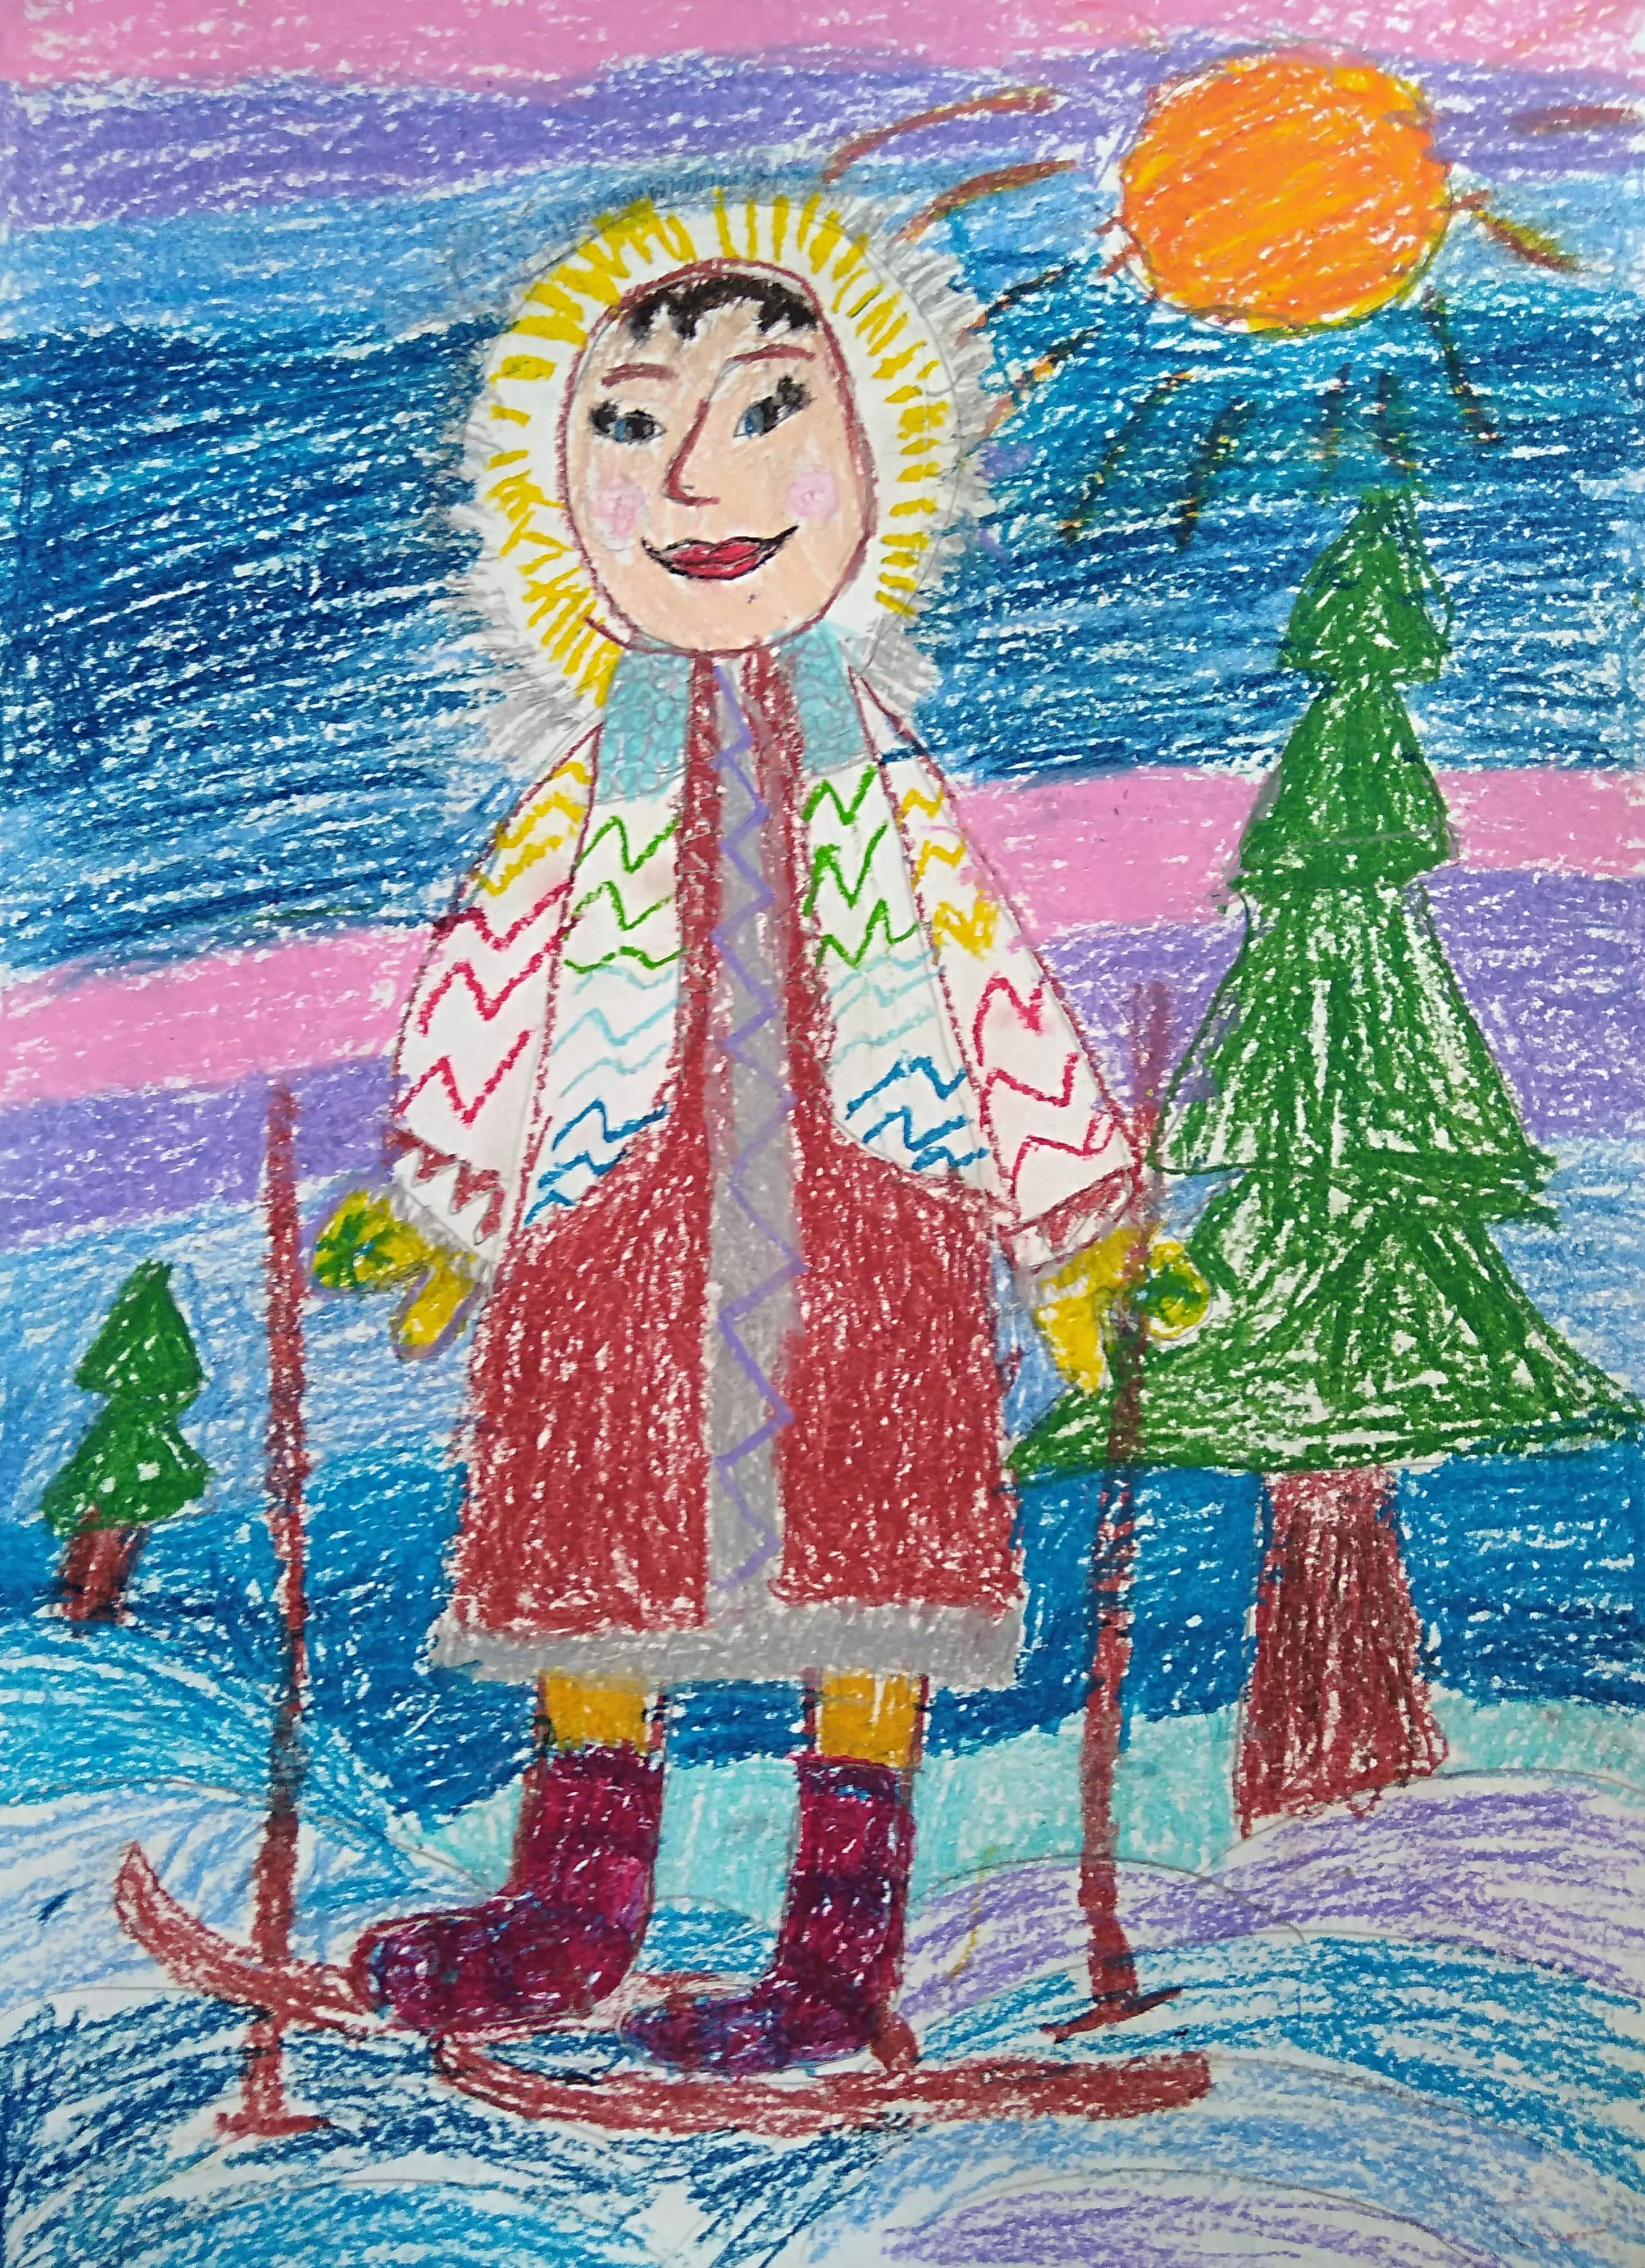 Роскова Анастасия, 9 лет